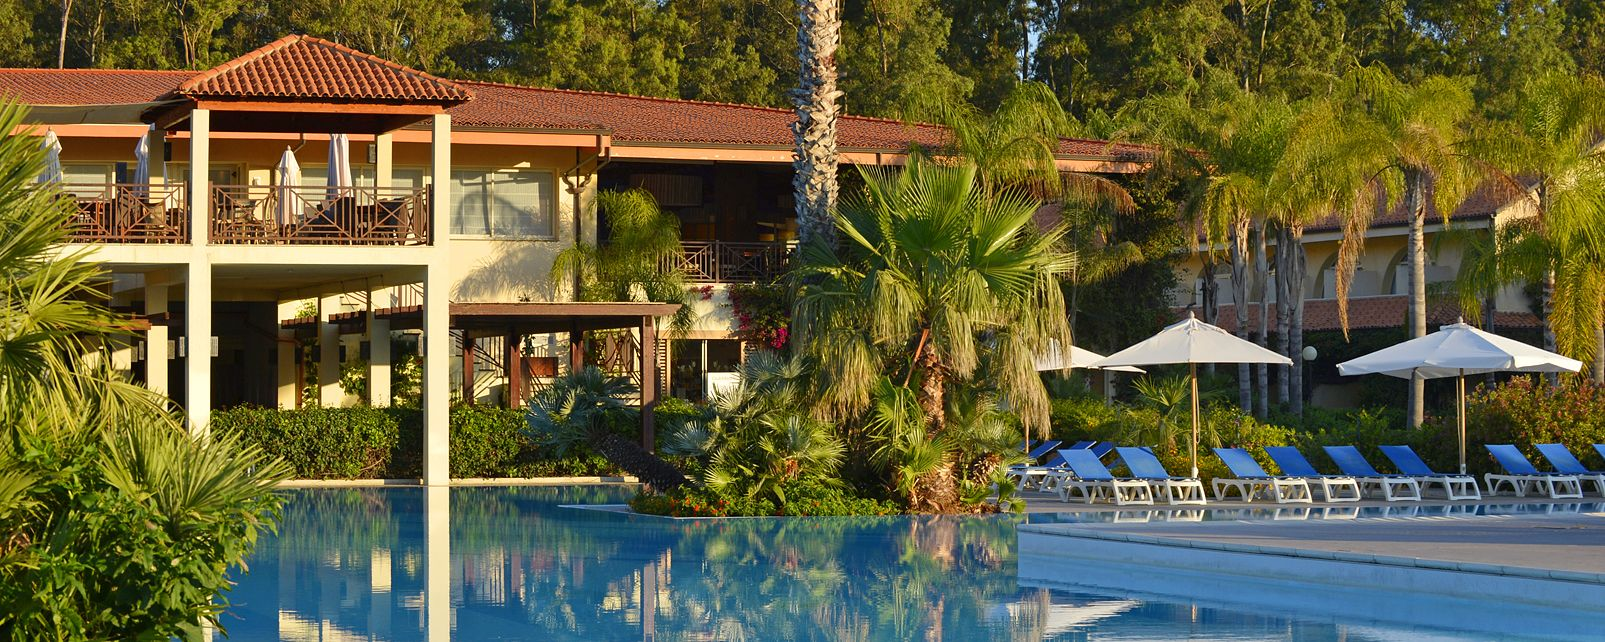 Hôtel Club Med Napitia